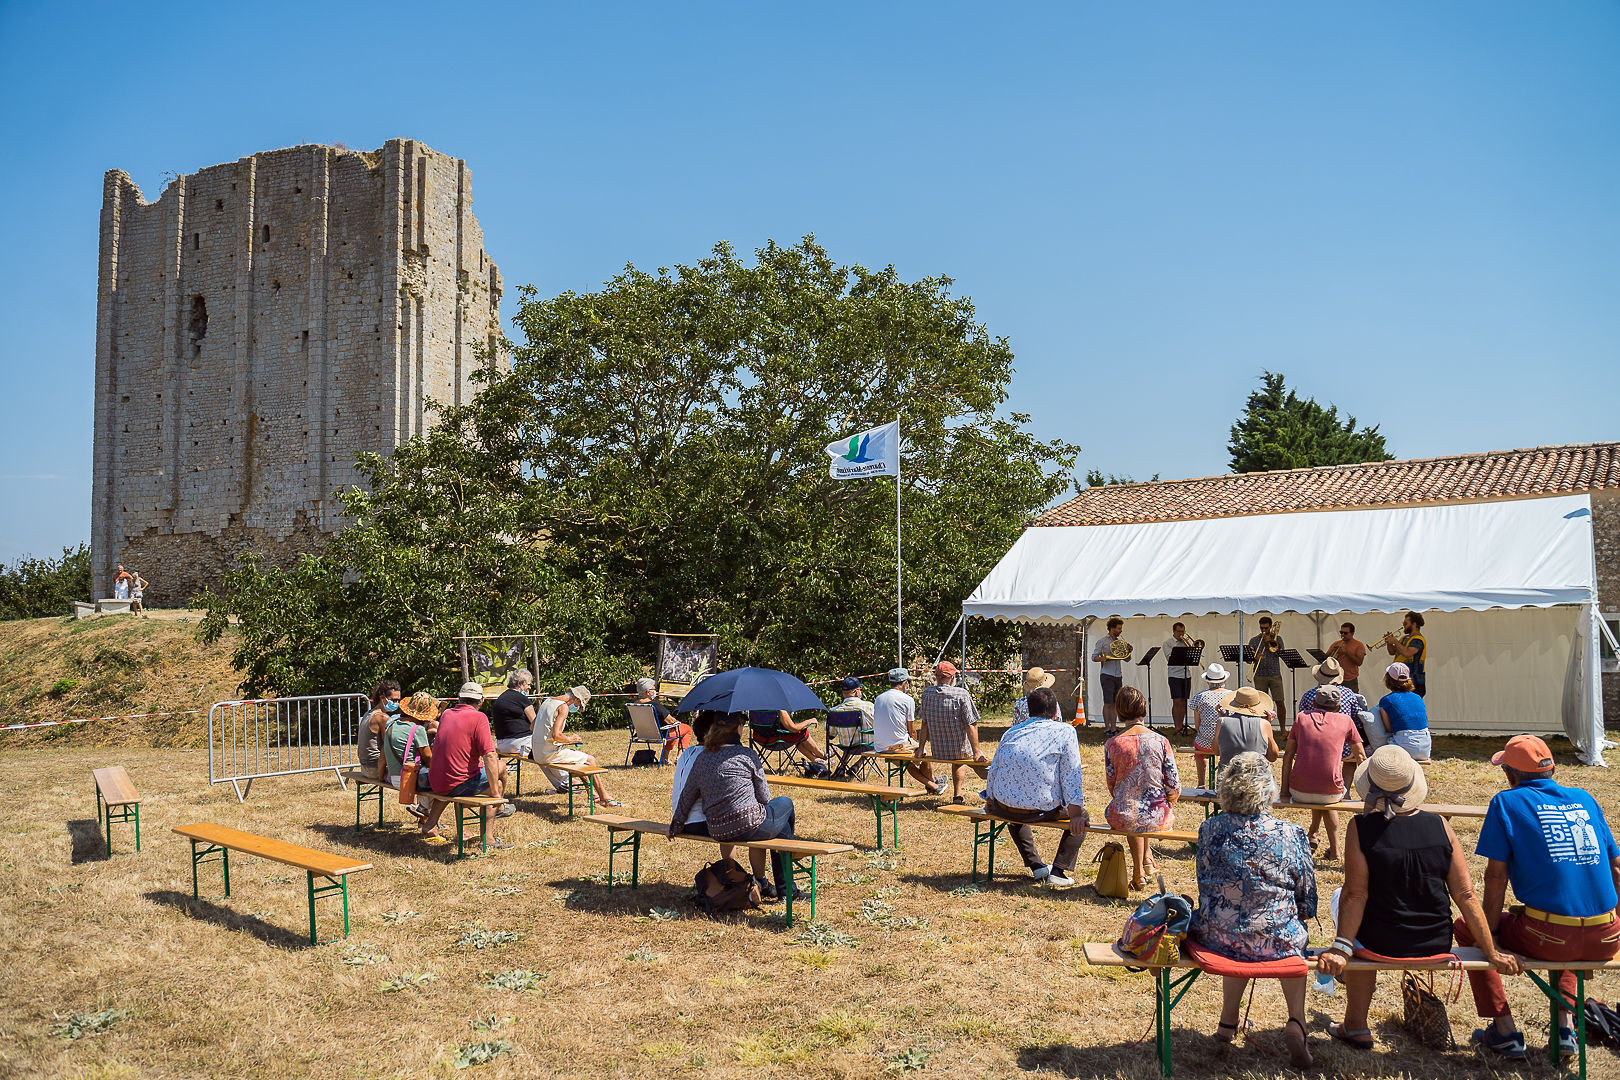 Tour de Broue de Saint-Sornin - 08/08/2020